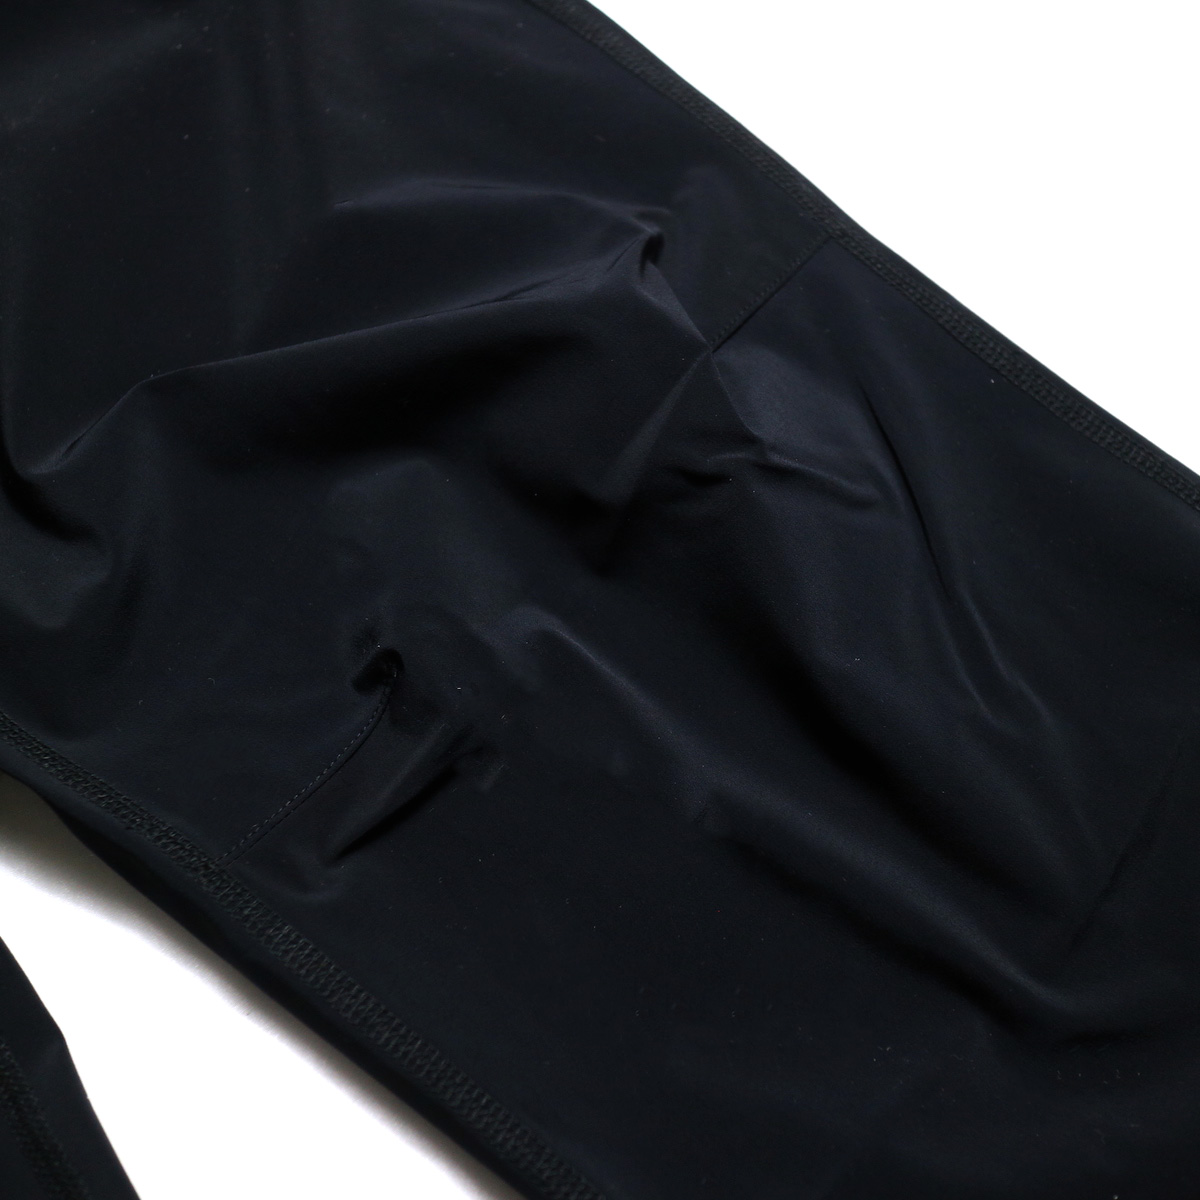 SOUTH2 WEST8 / 1P Cycle Pant-N/Pu Taffeta (Black) 膝